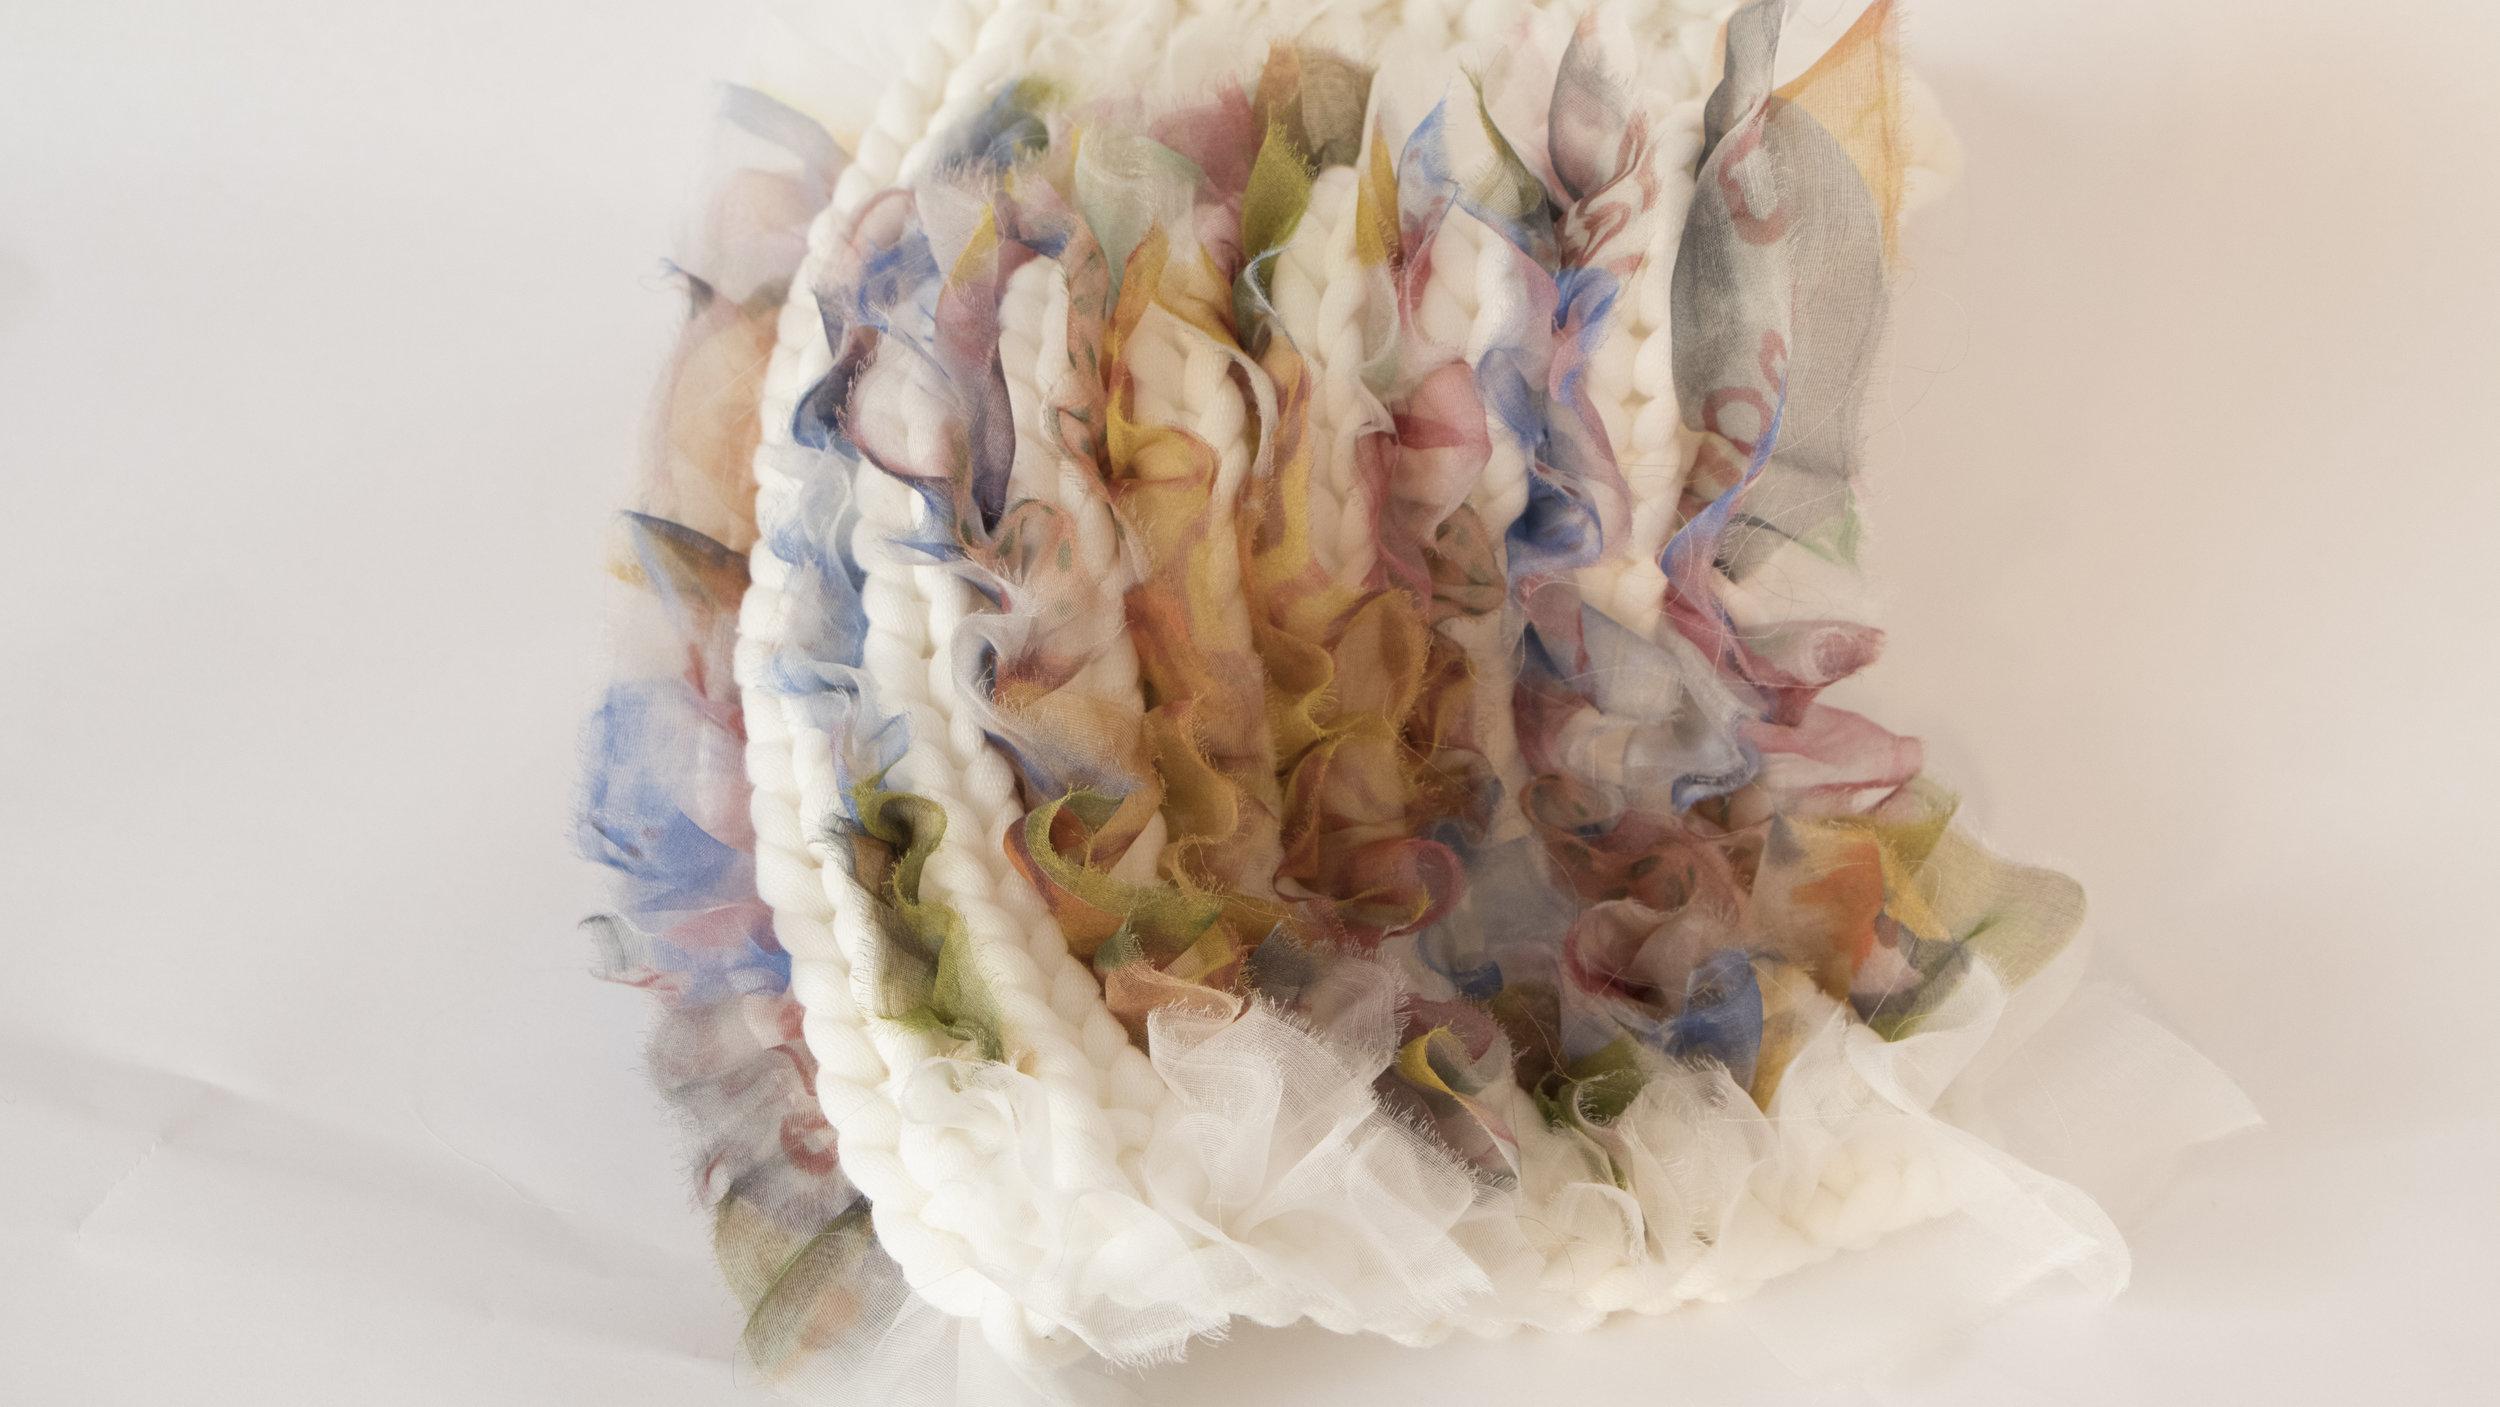 Textile design #4 knitting